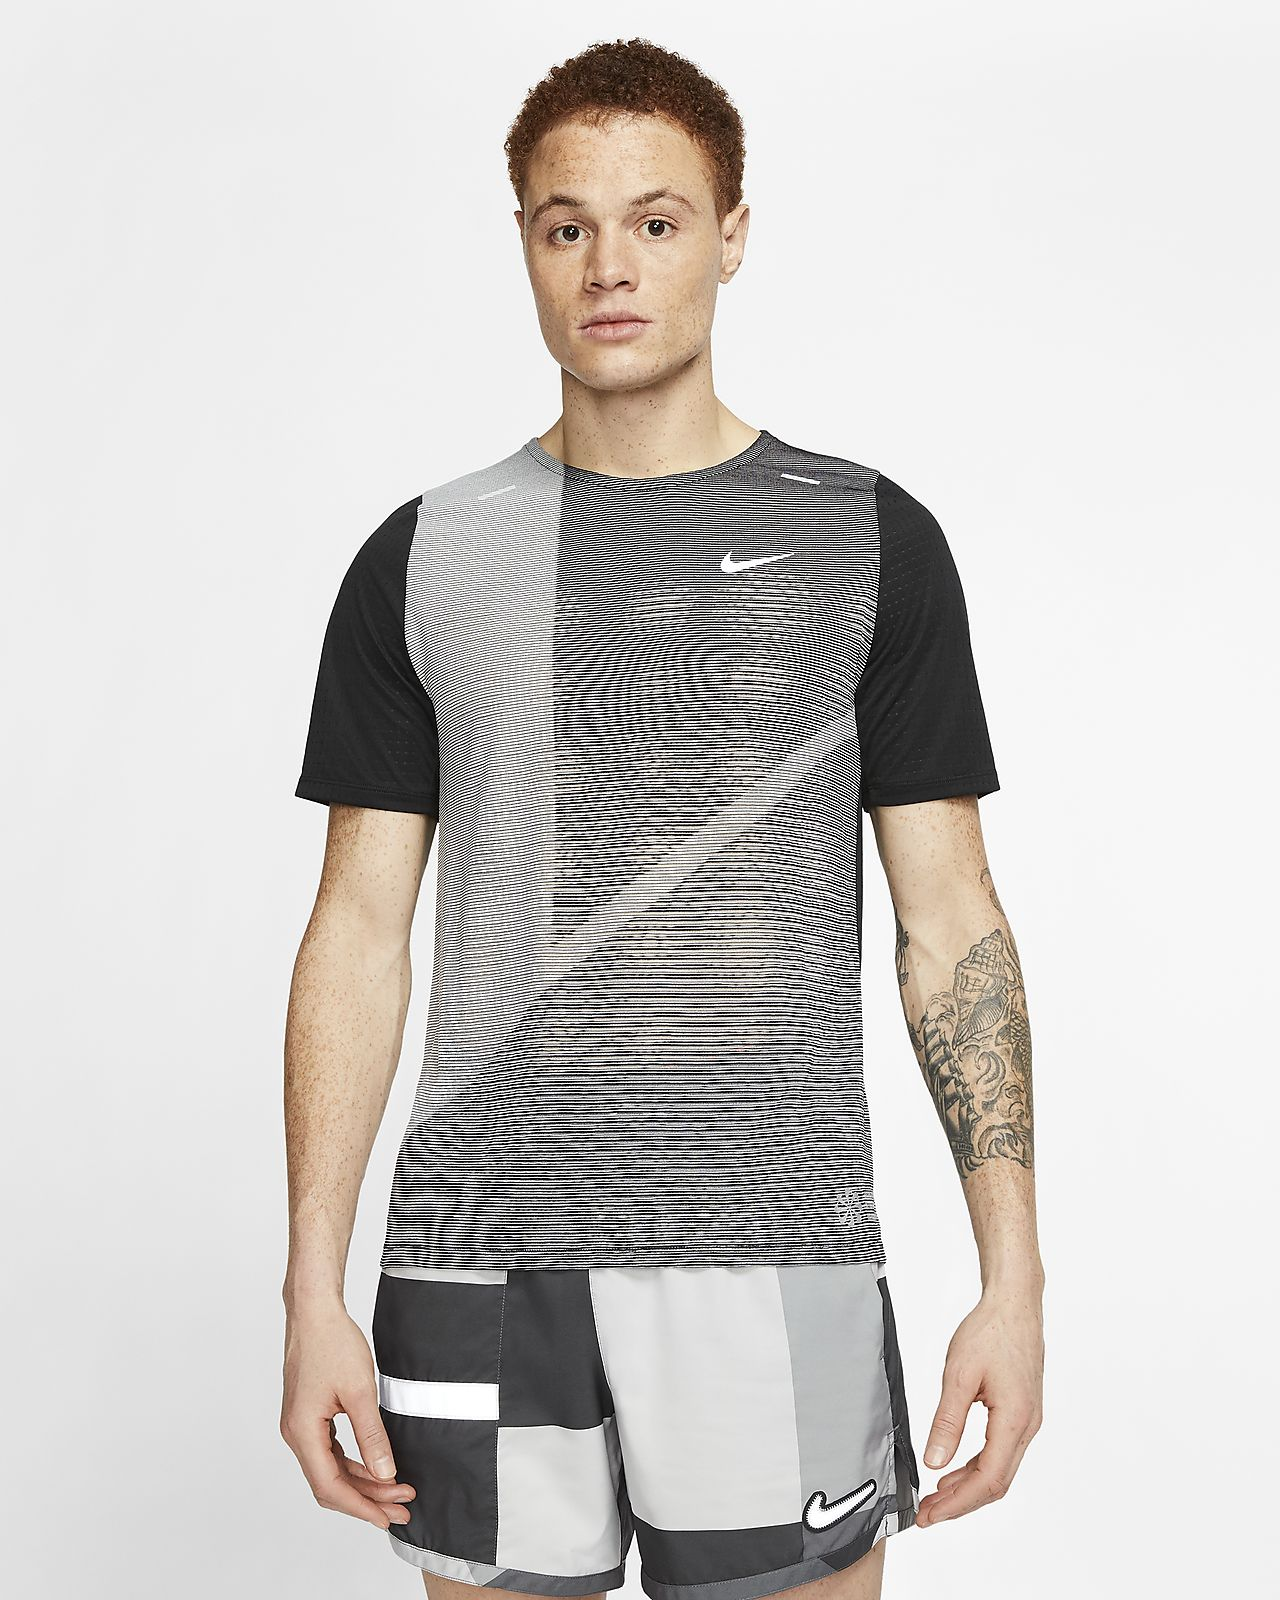 Nike Rise 365 Future Fast Men's Running